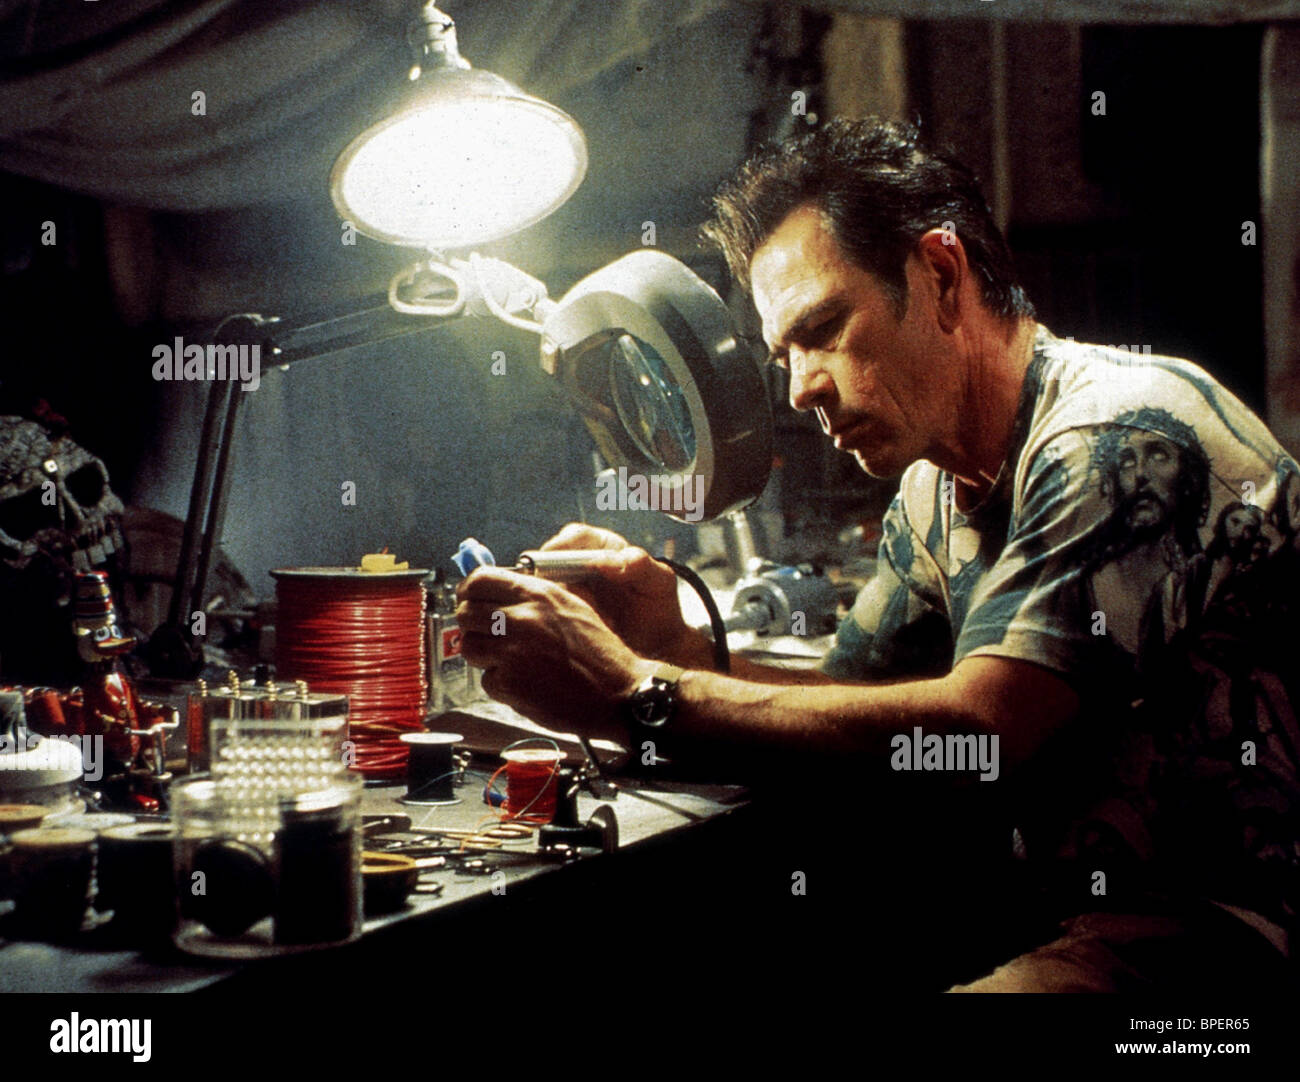 TOMMY LEE JONES BLOWN AWAY (1994 Stock Photo - Alamy